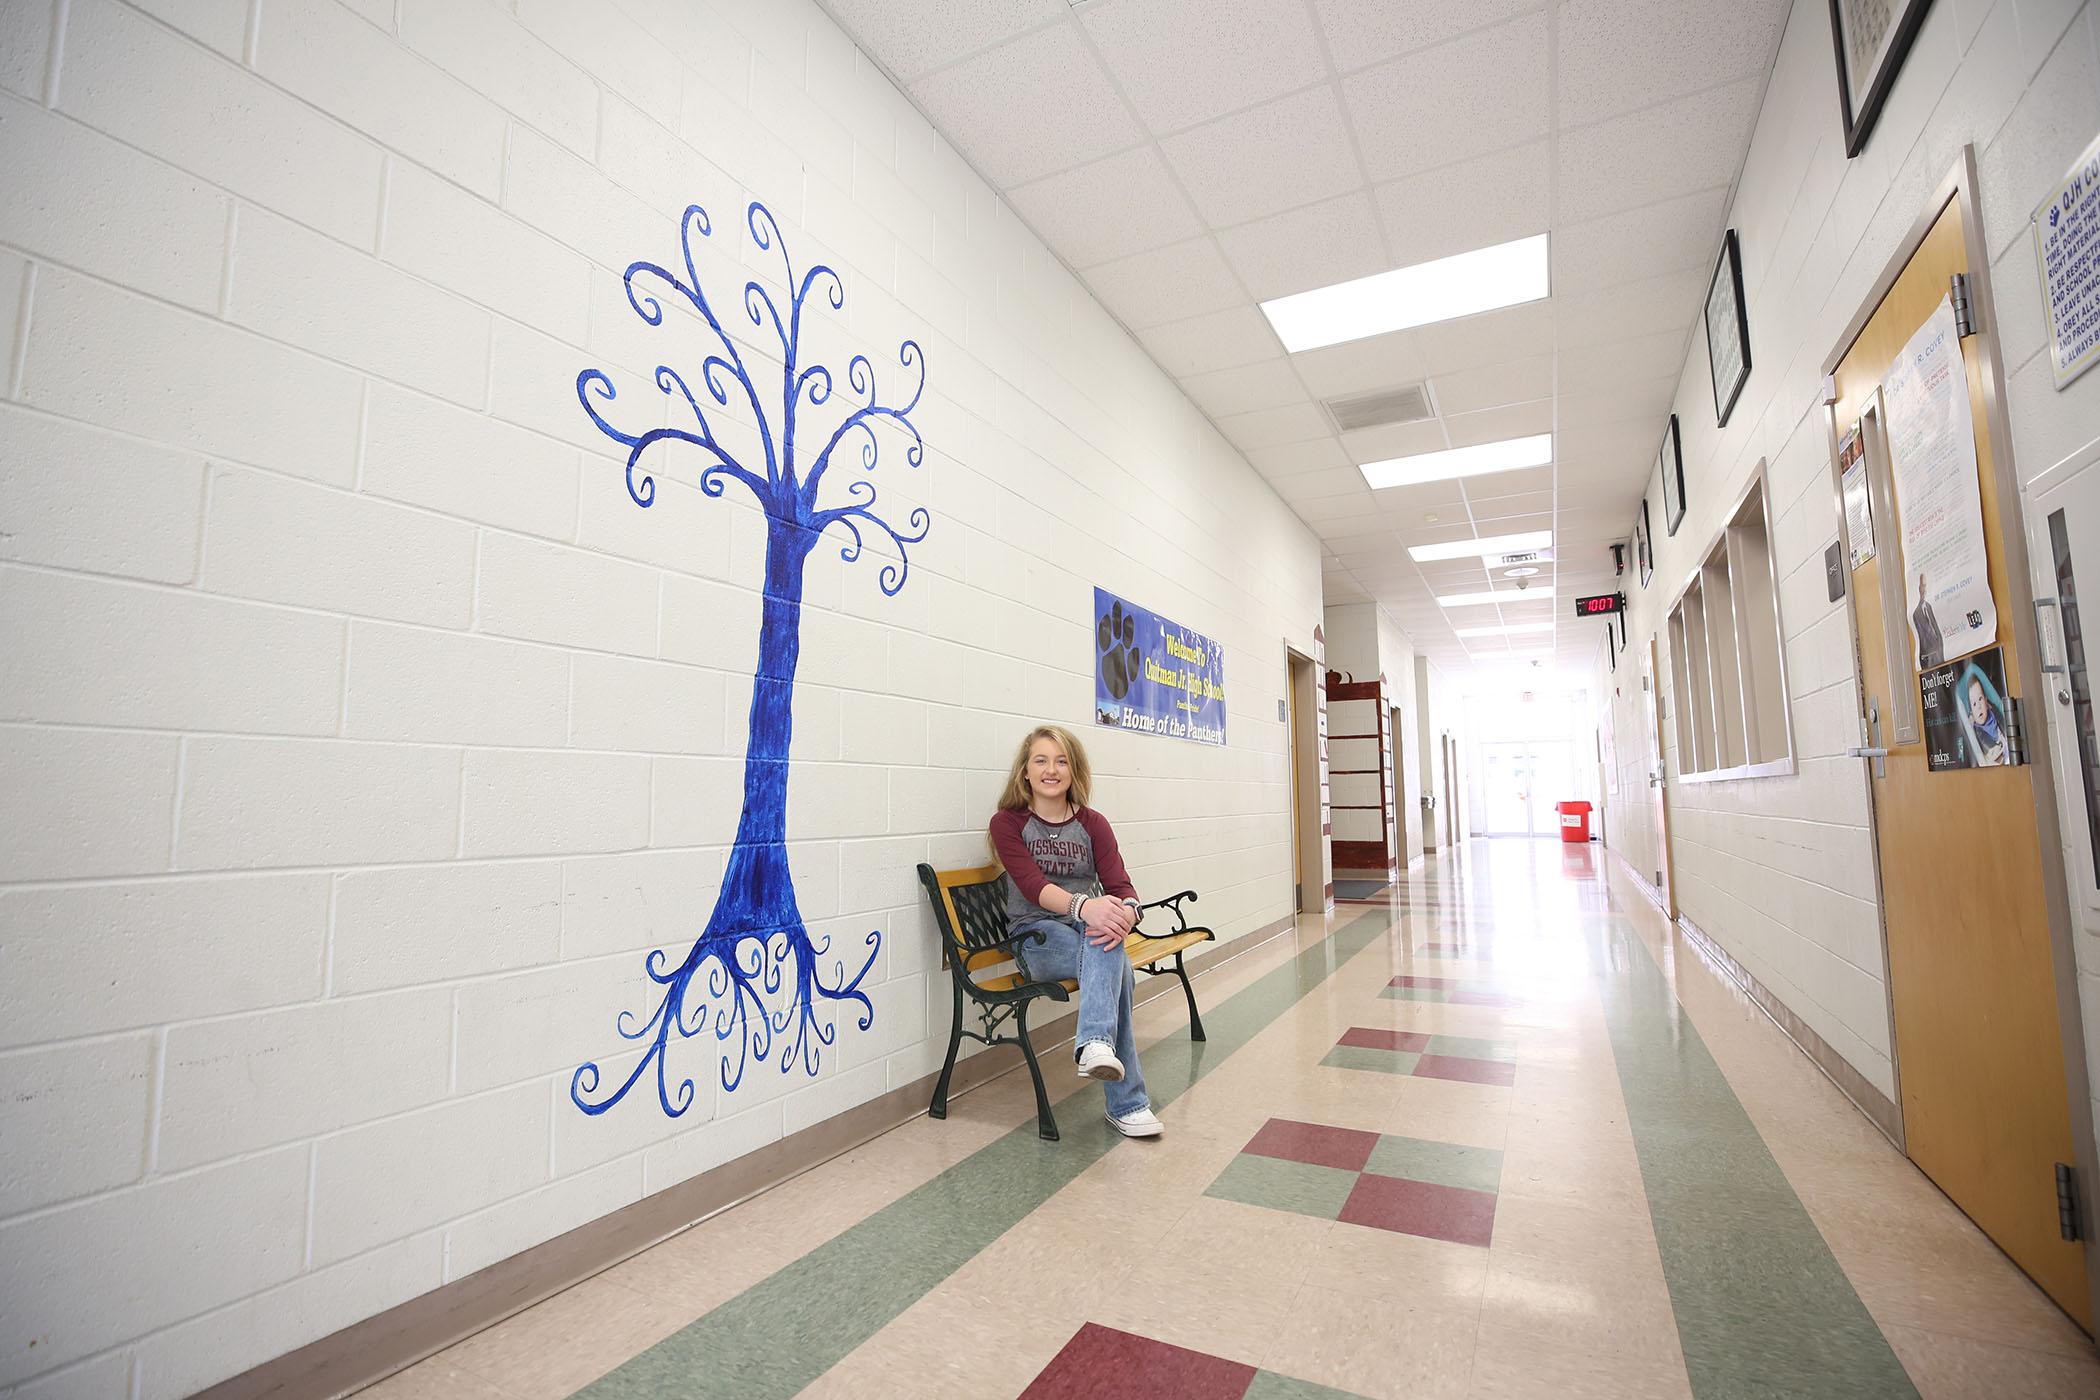 QJH student sits near mural.